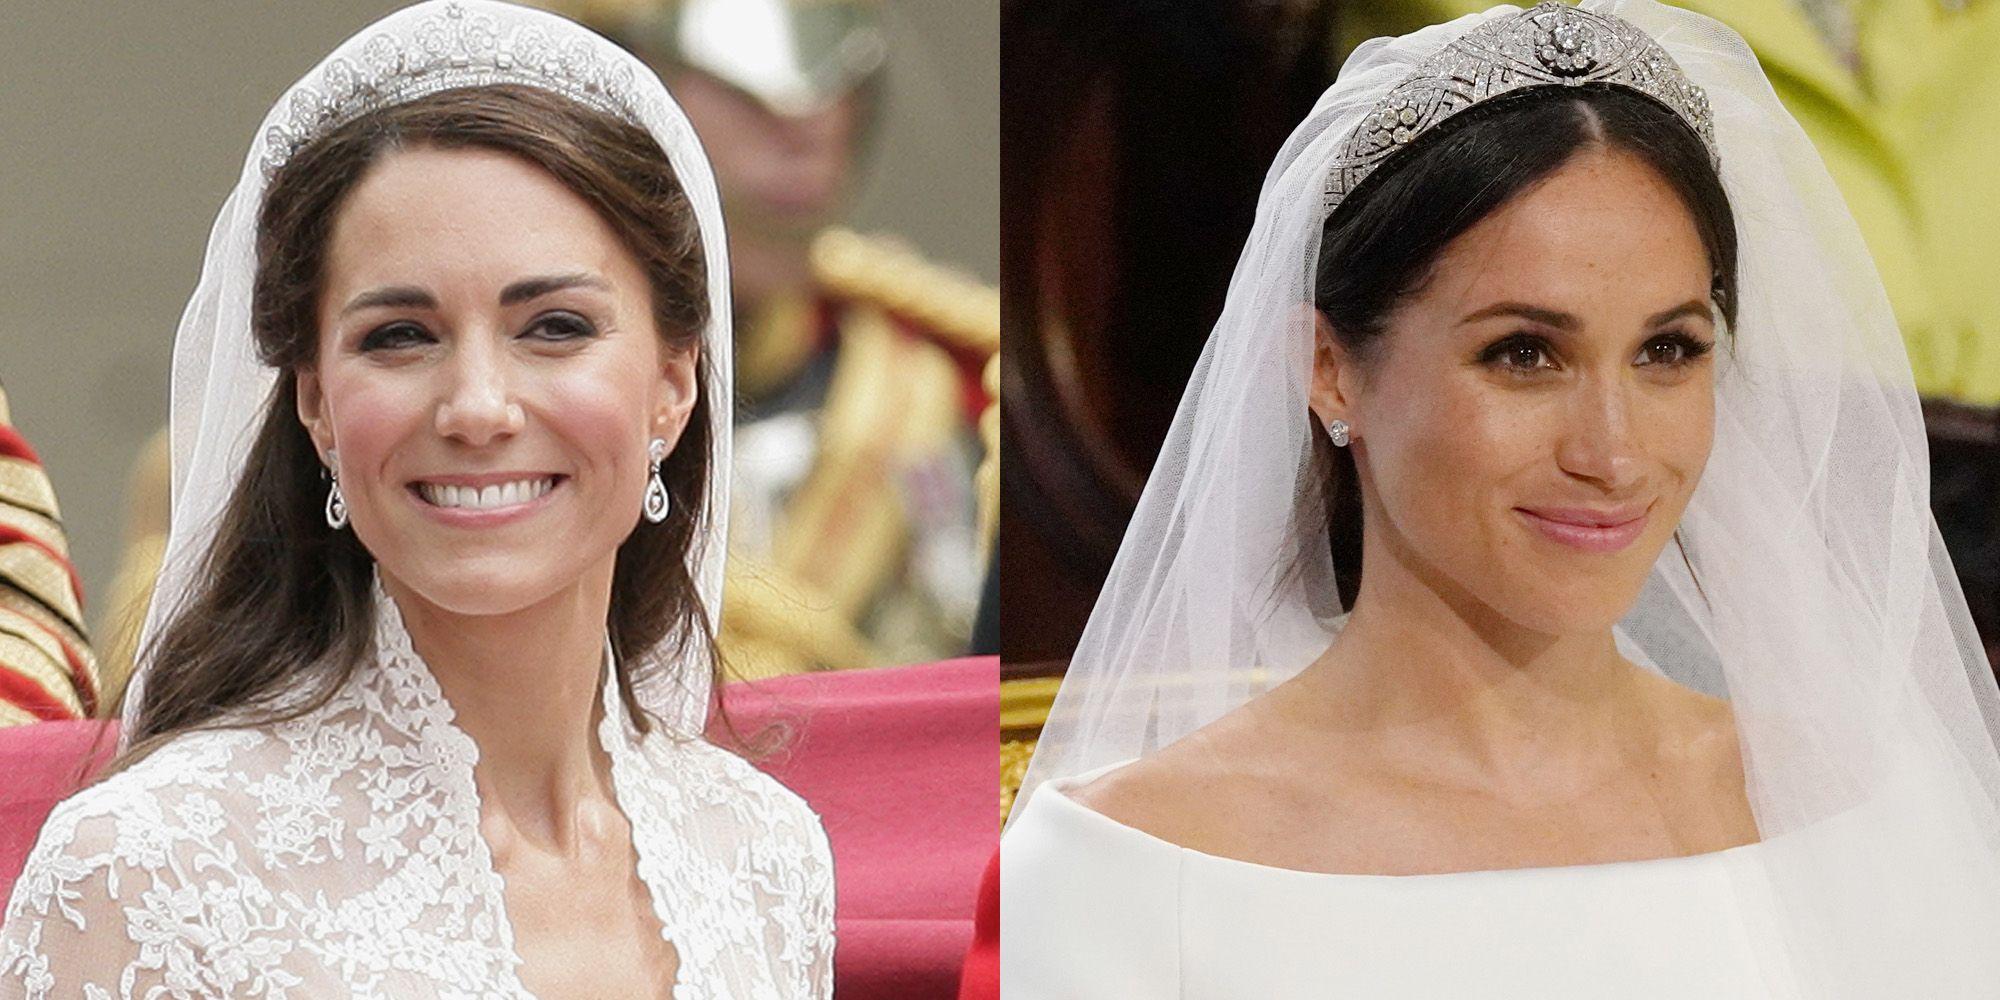 Meghan Markles Royal Wedding Makeup And Kate Middletons Wedding Makeup Compared